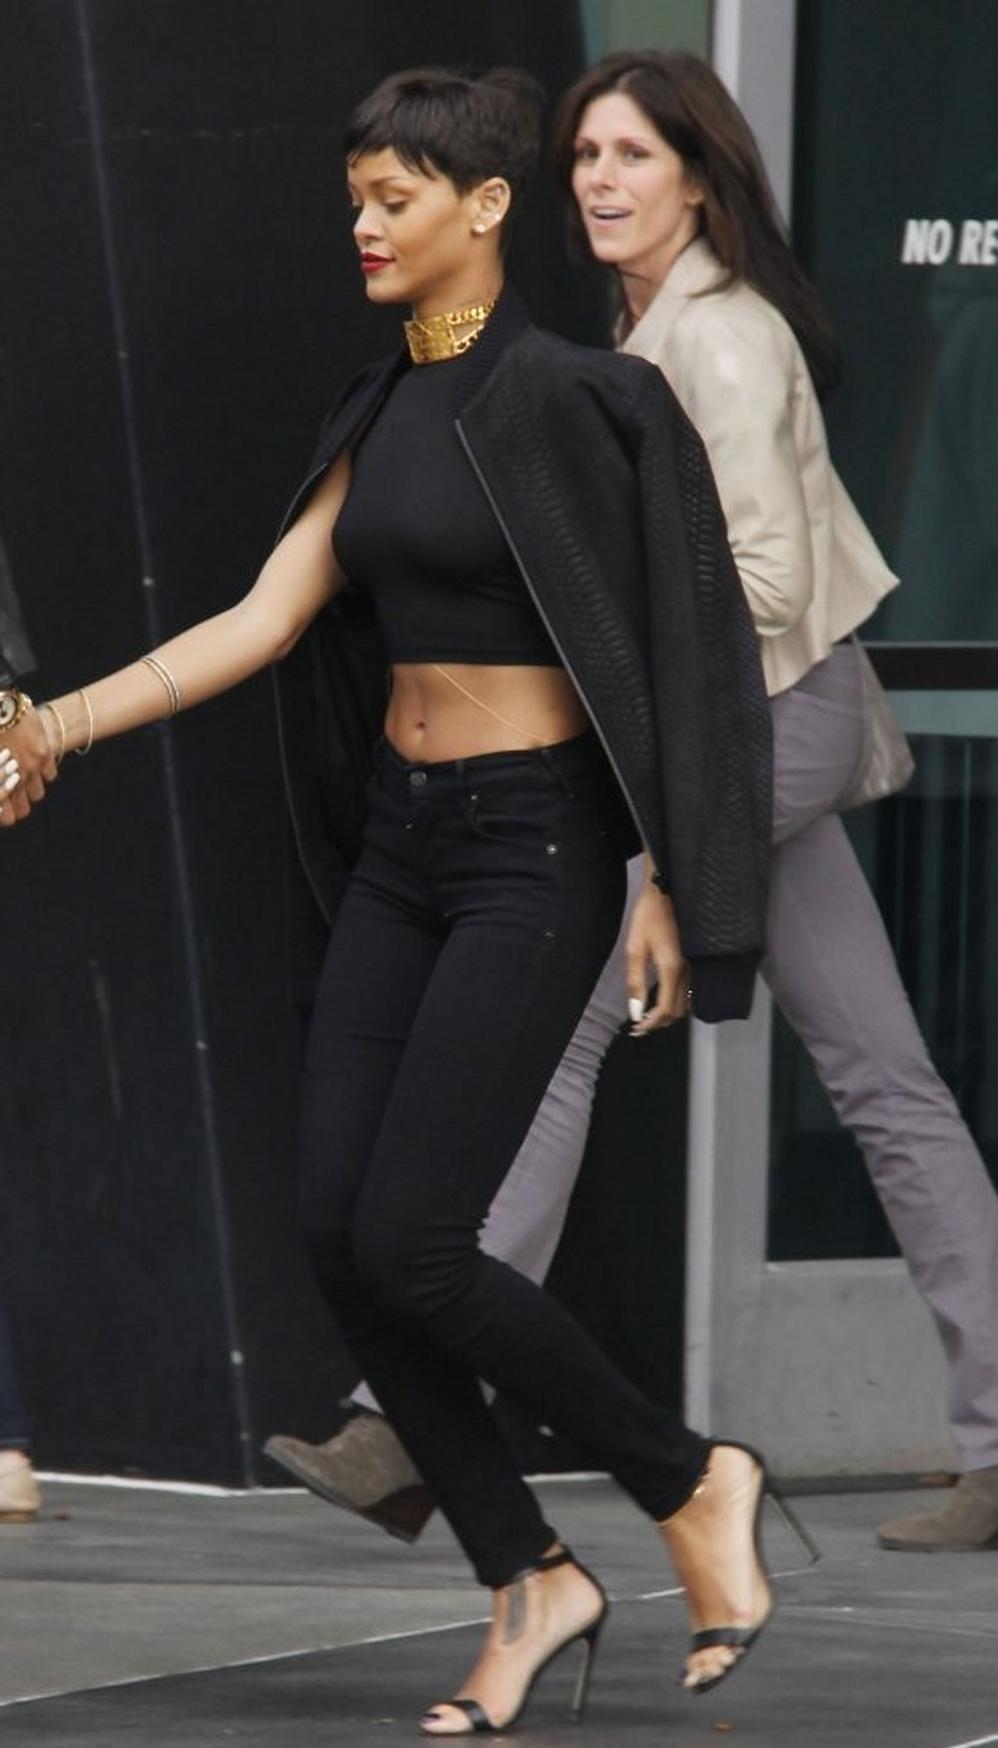 Black sandals rihanna - Rihanna Photos Photos Chris Brown And Rihanna Leaving The Lakers Game